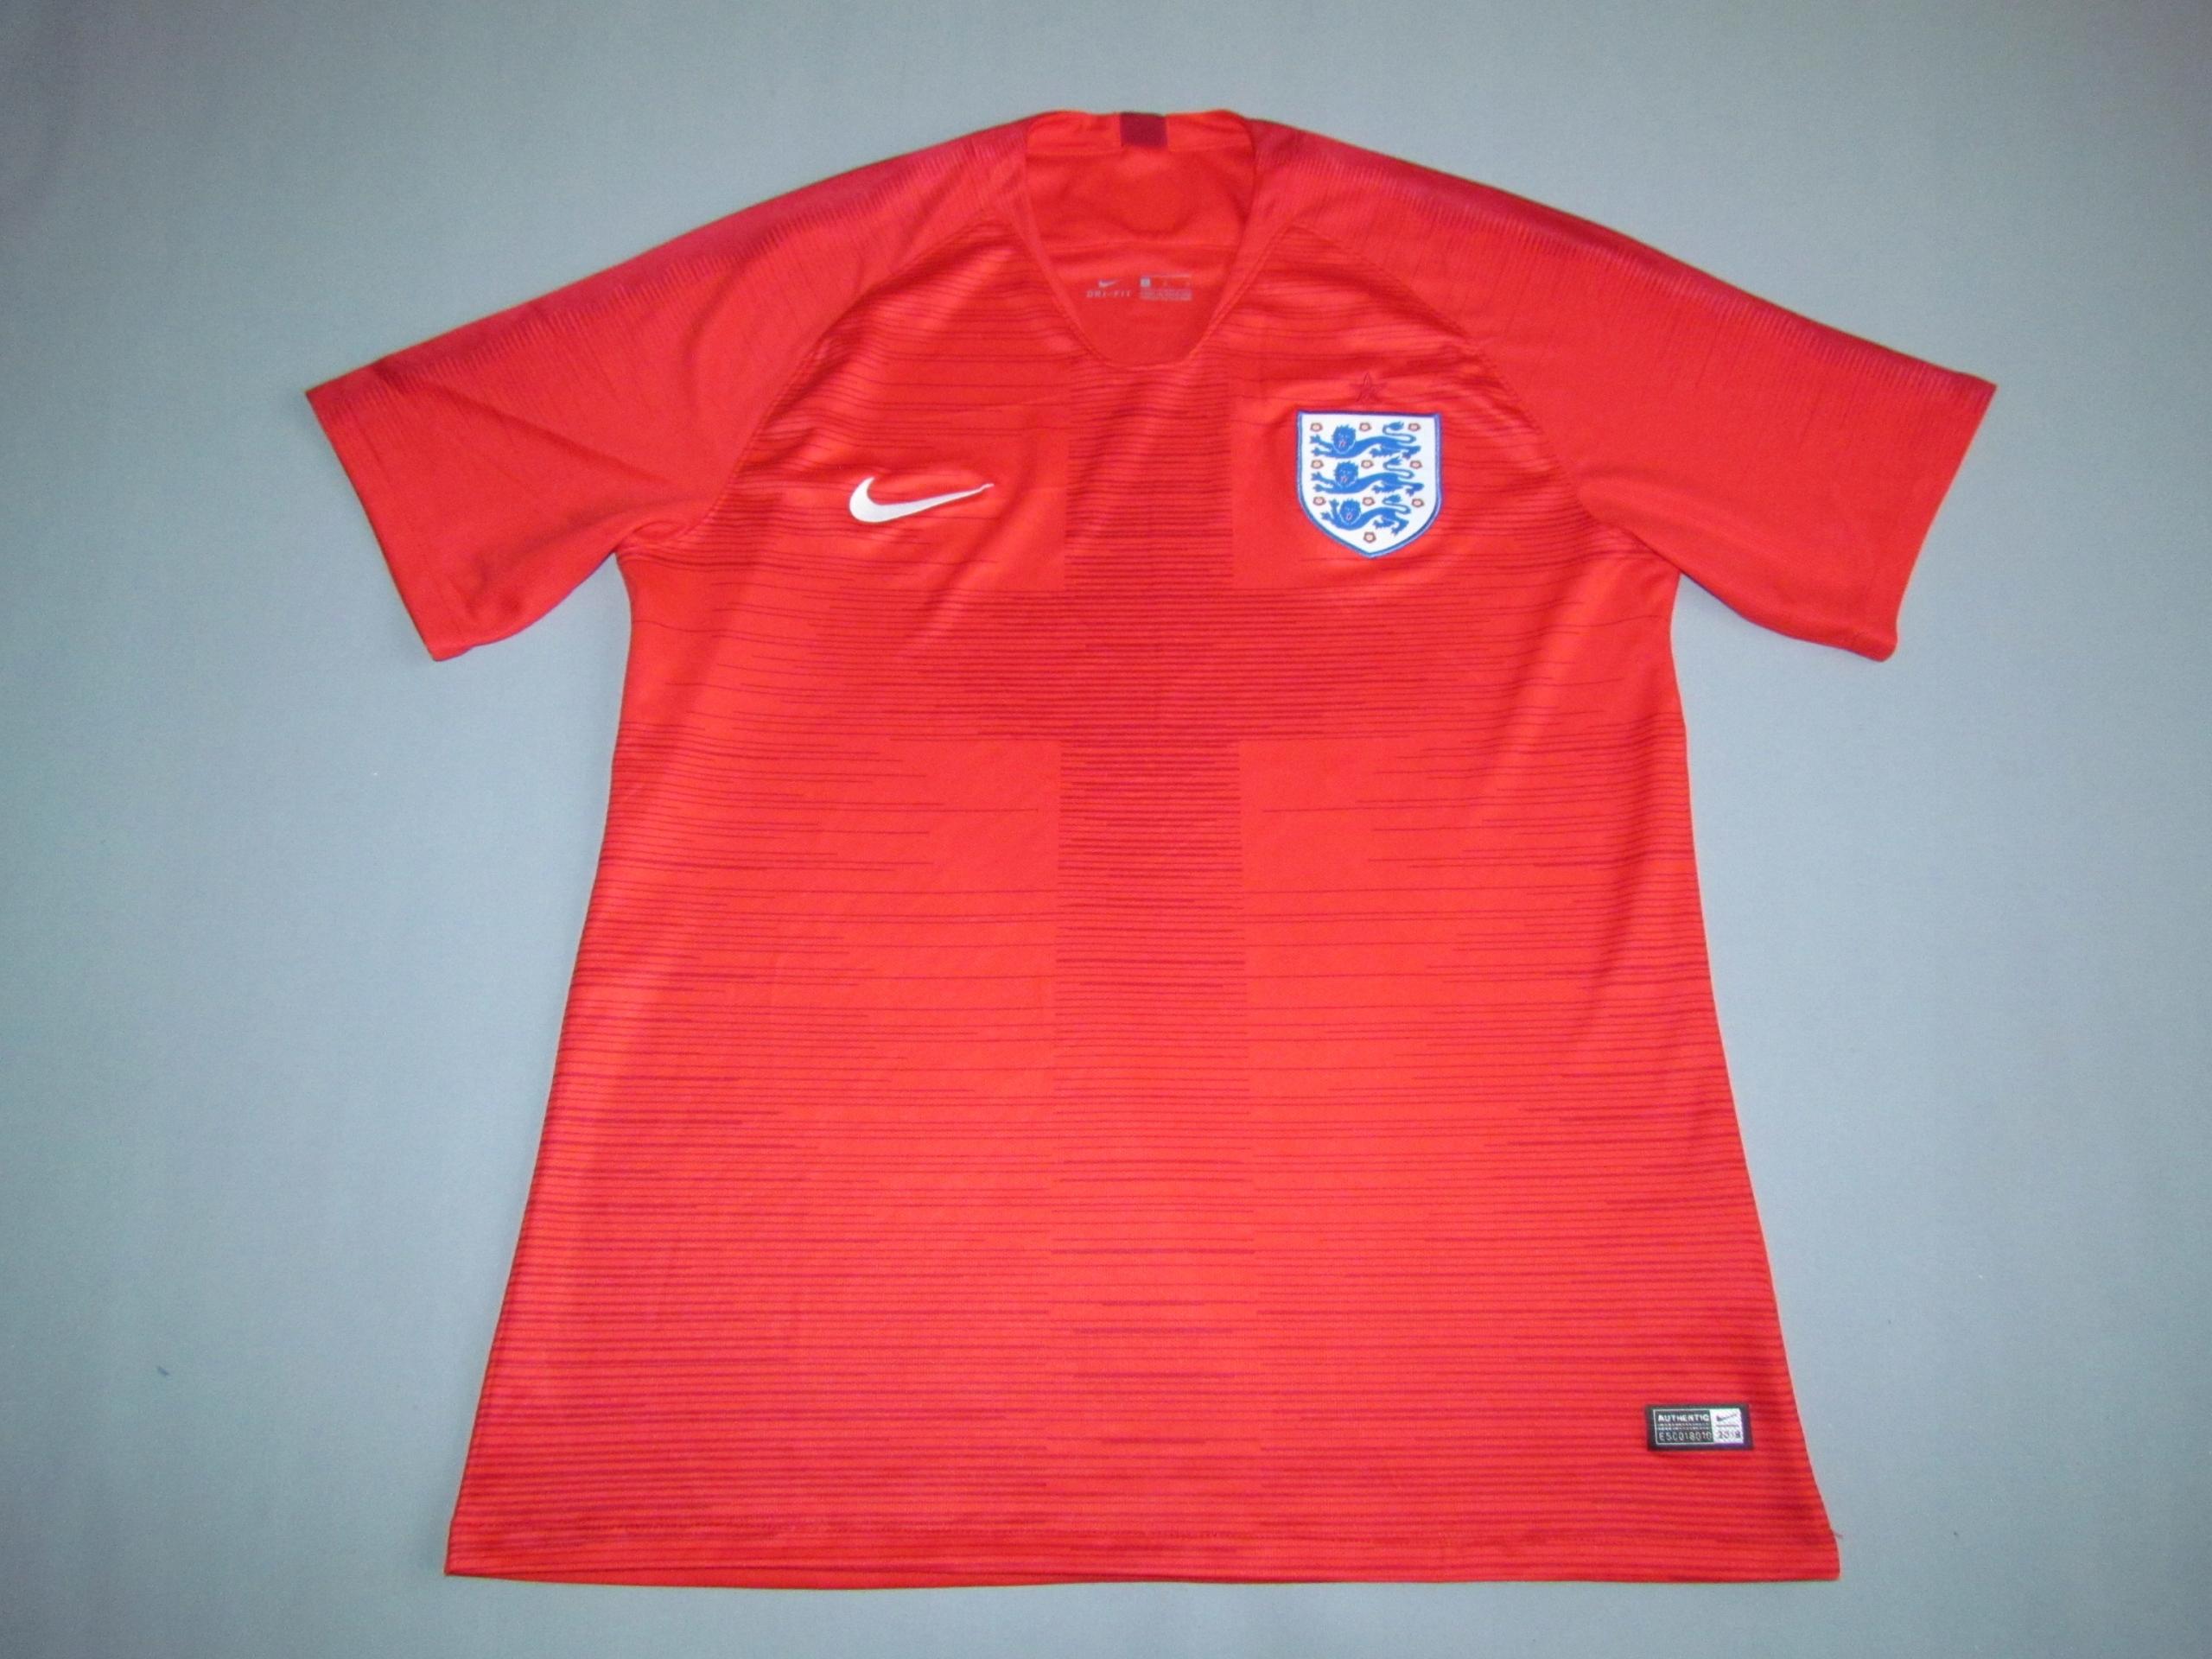 Koszulka Nike Anglia roz.L